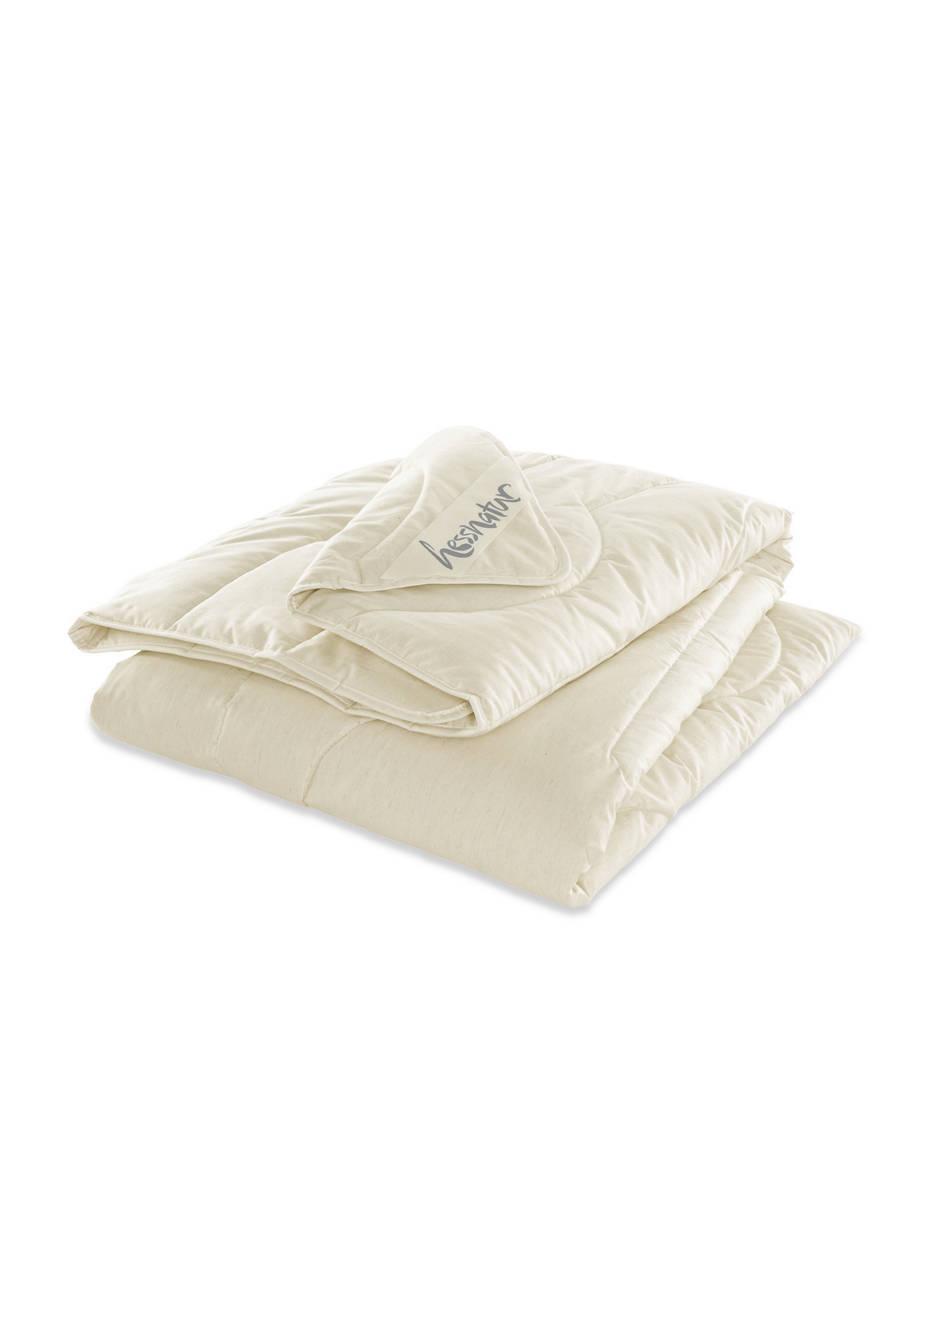 Linen summer blanket with organic cotton